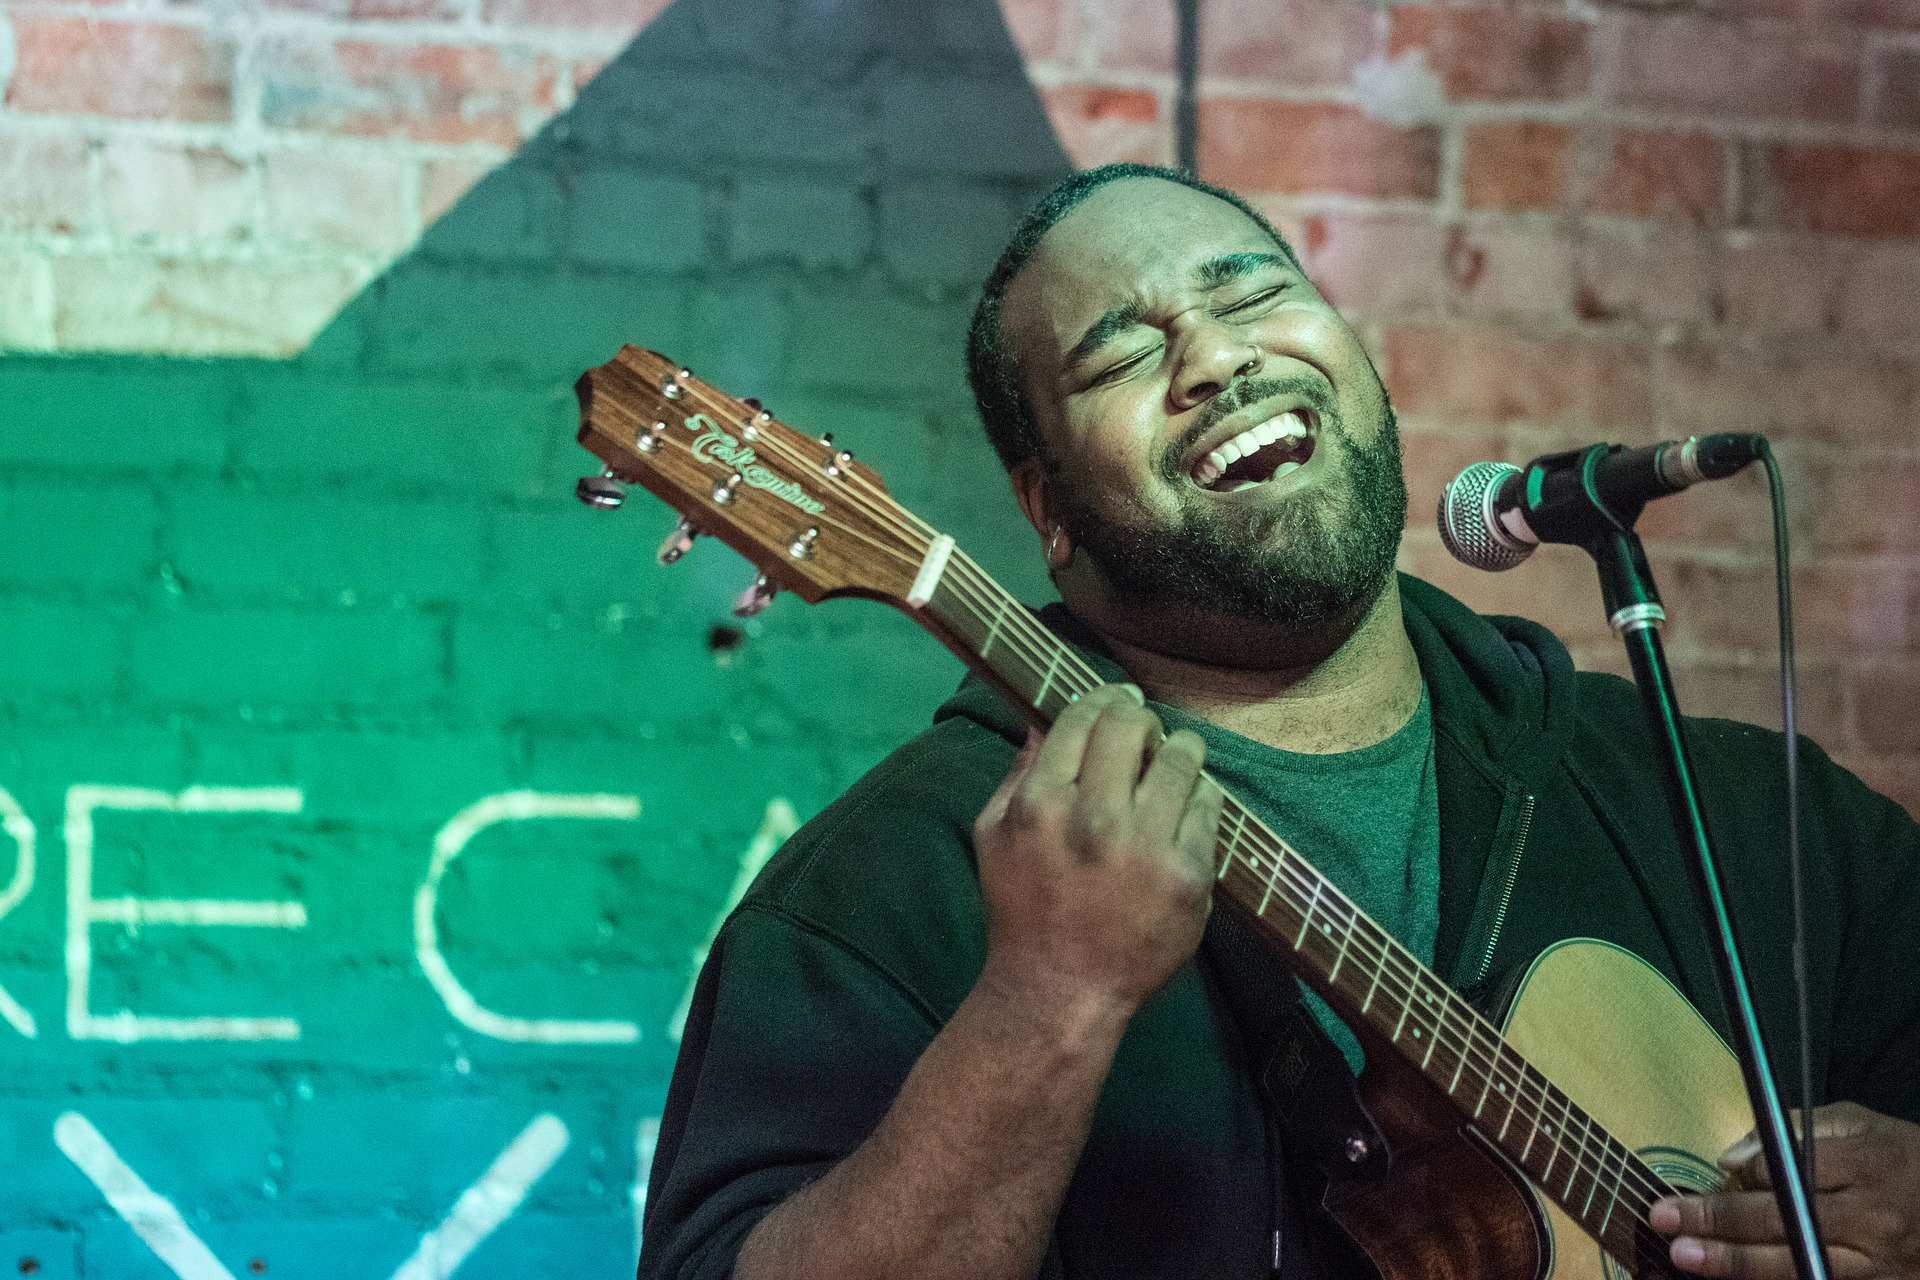 Grants to Help UK Black Music Creators through COVID-19 Difficulties